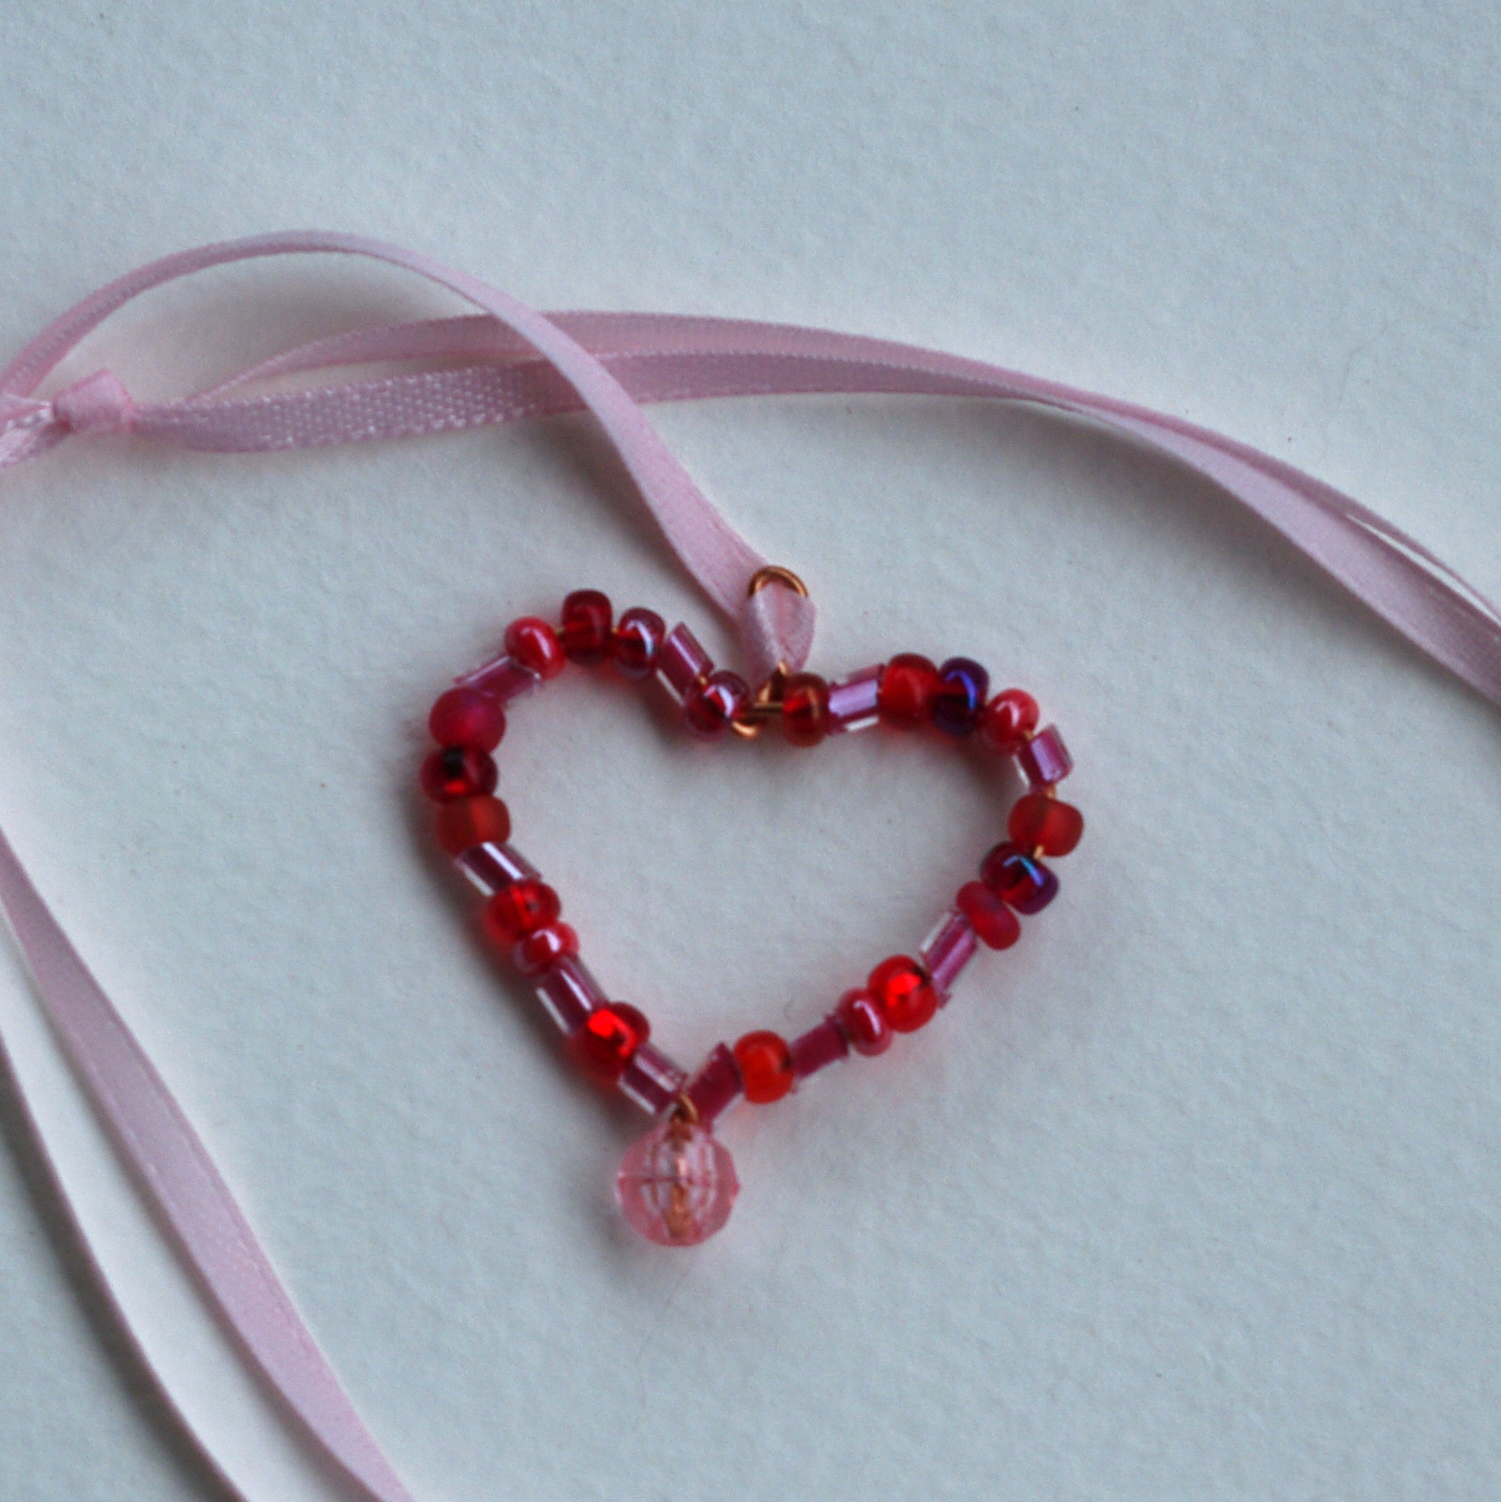 passengers on a little spaceship handmade valentine ideas for classmates - Valentine Ideas For Classmates